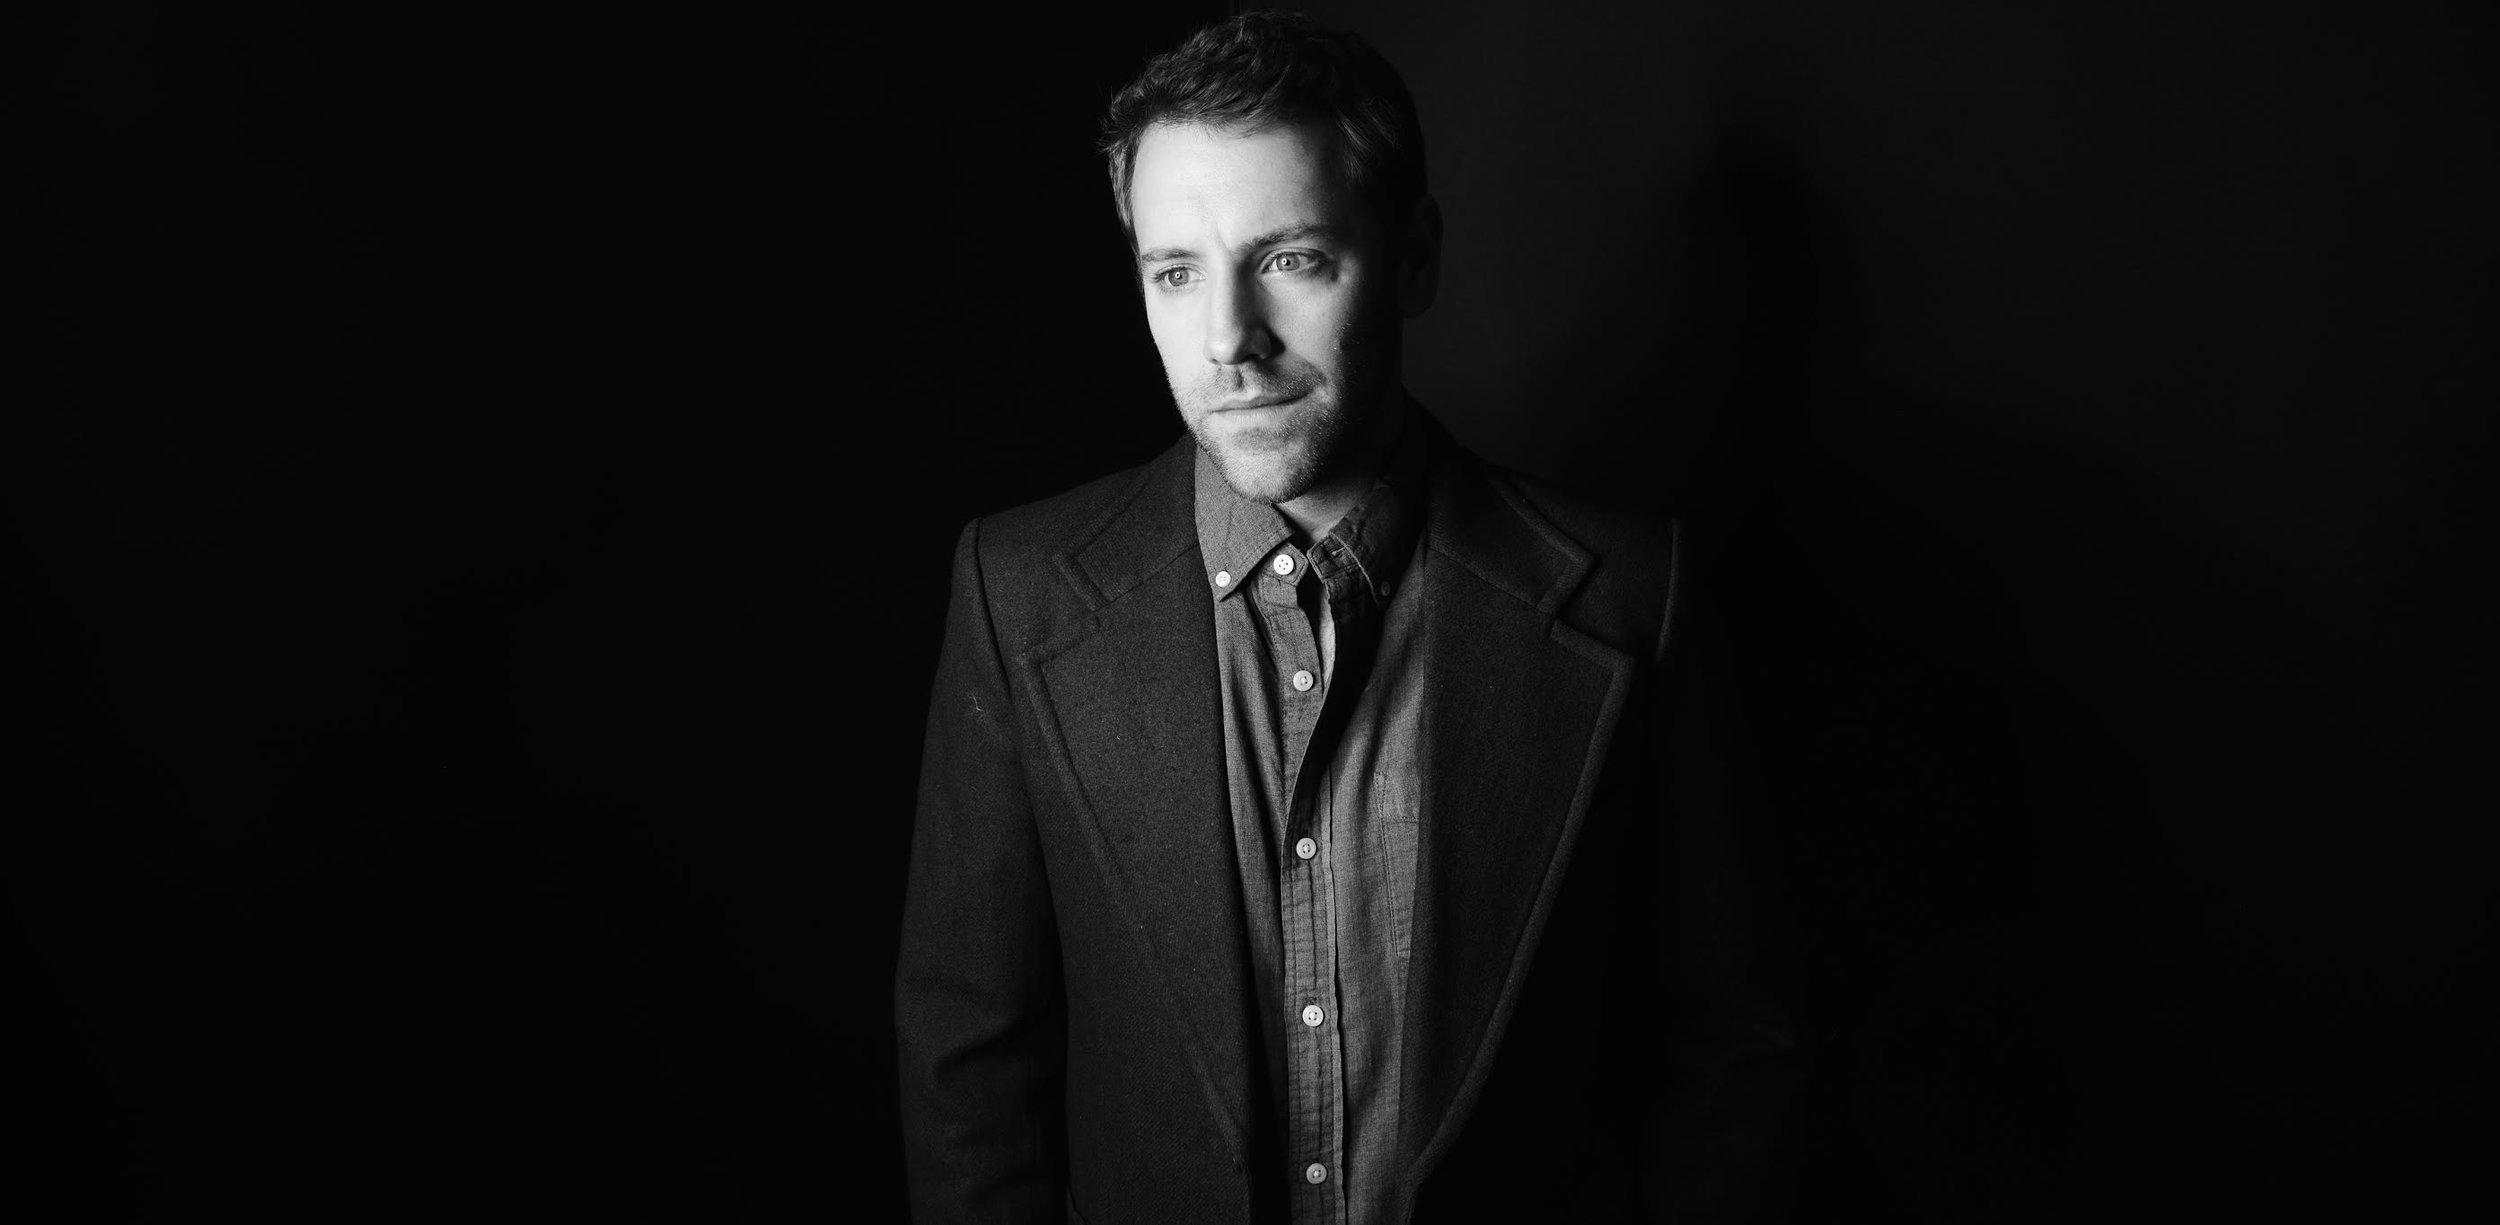 Trevor-Jarvis-Cello-Los-Angeles-Composer